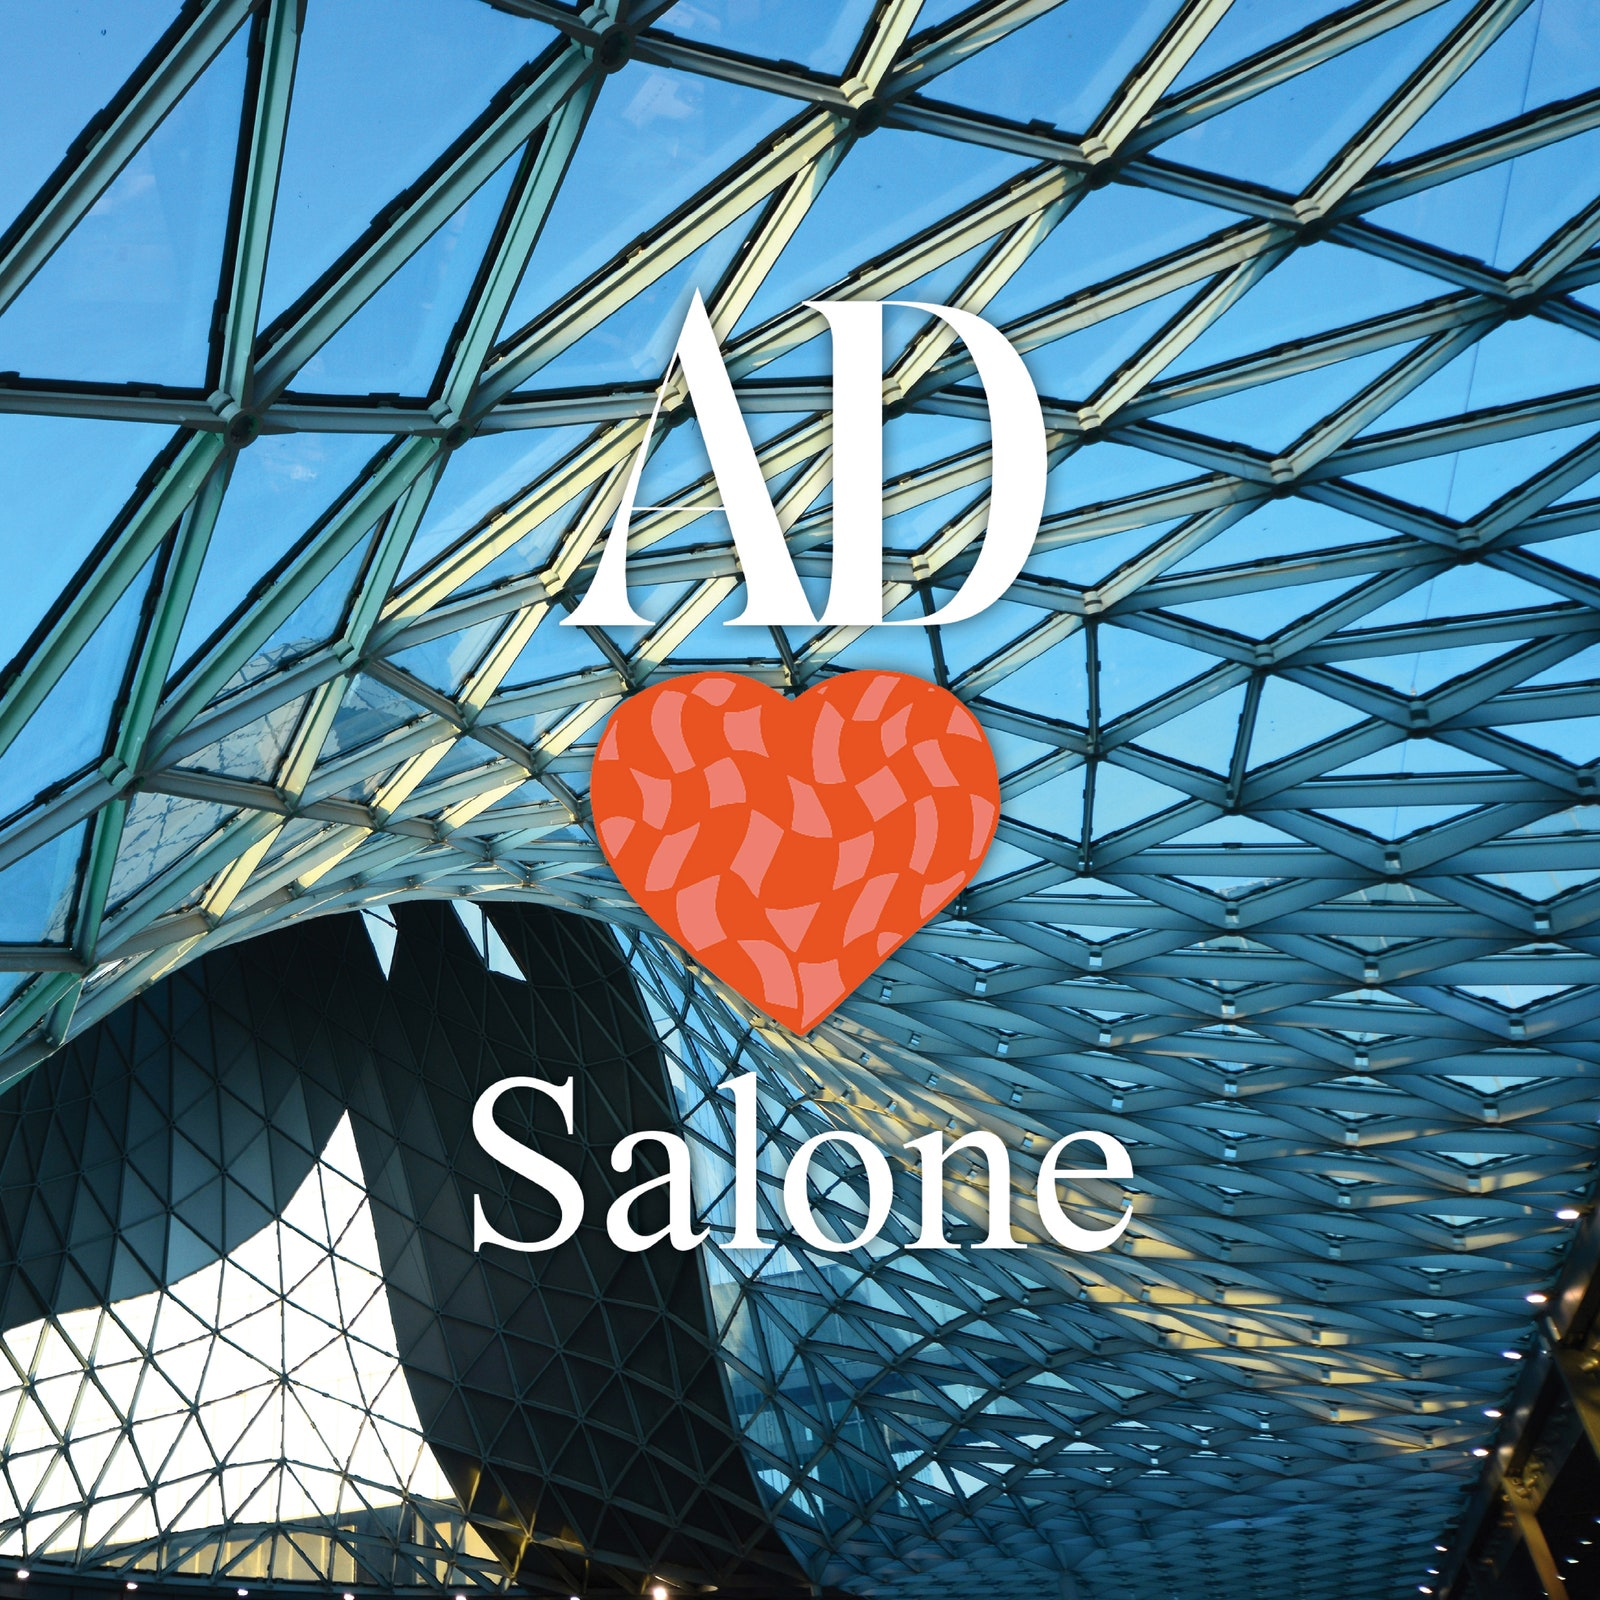 ADLovesSalone 10  AD